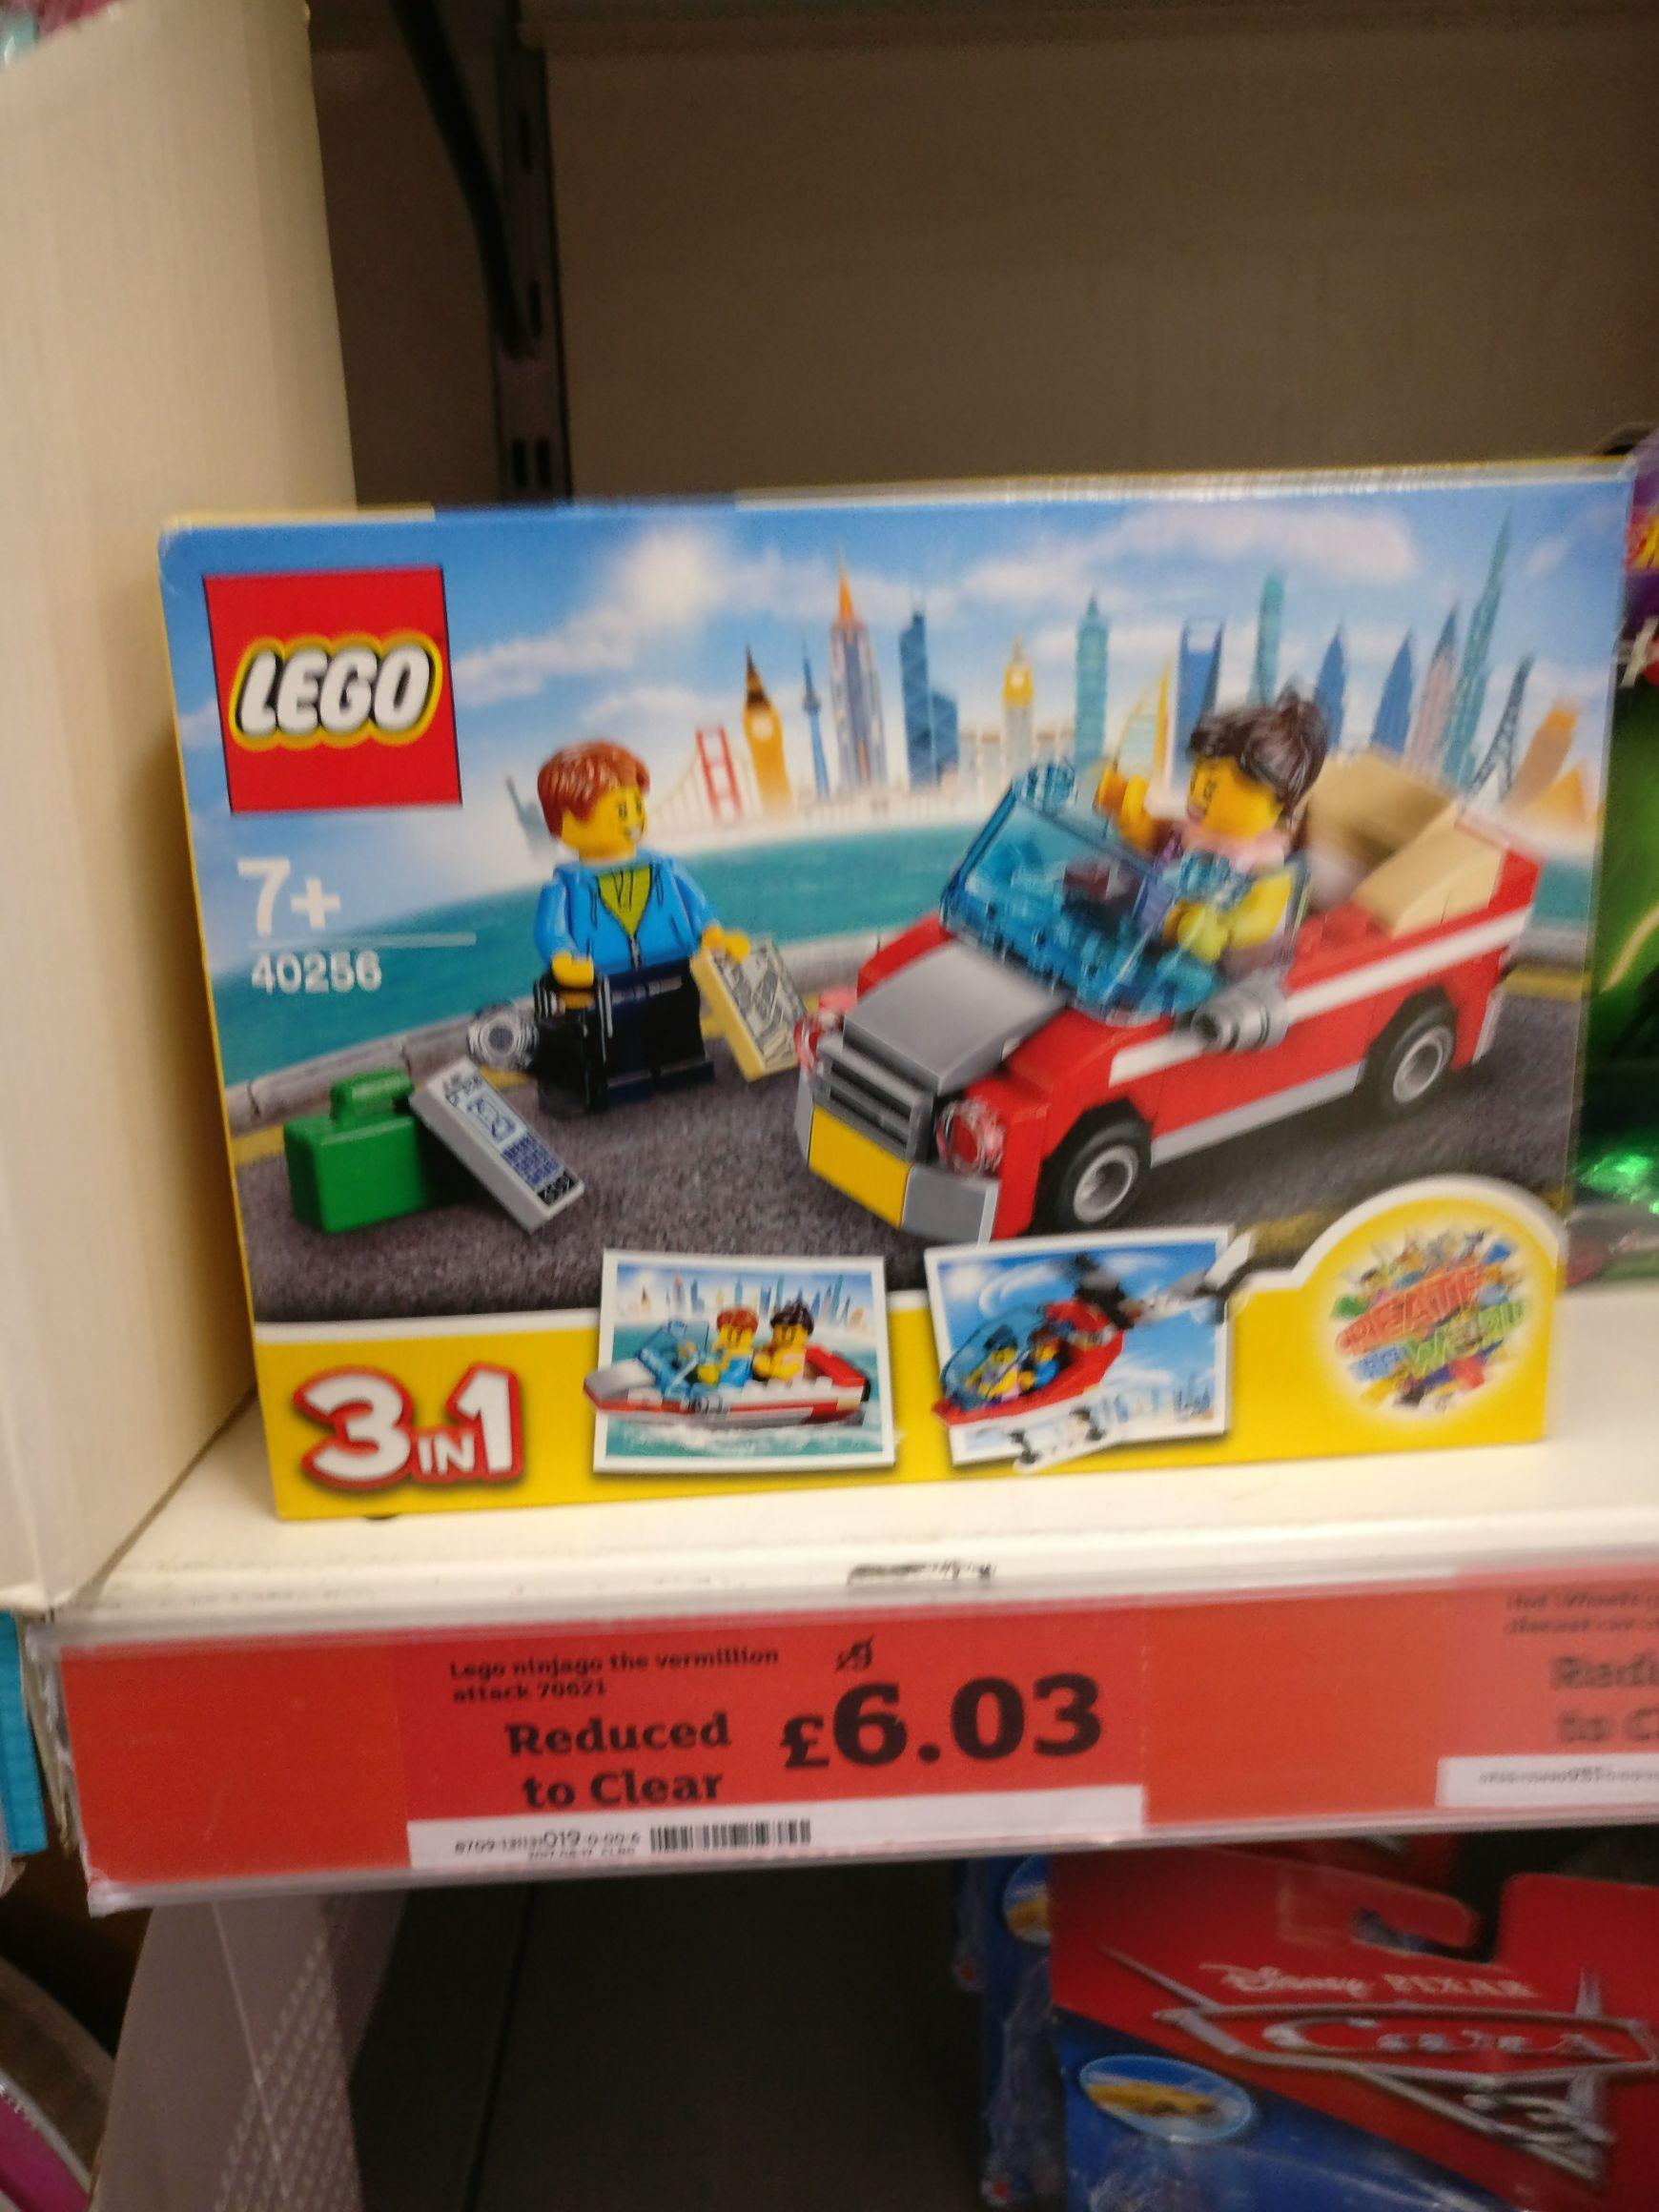 Lego 40256 - 3 in 1 £5.33 @ Sainsburys Hitchin